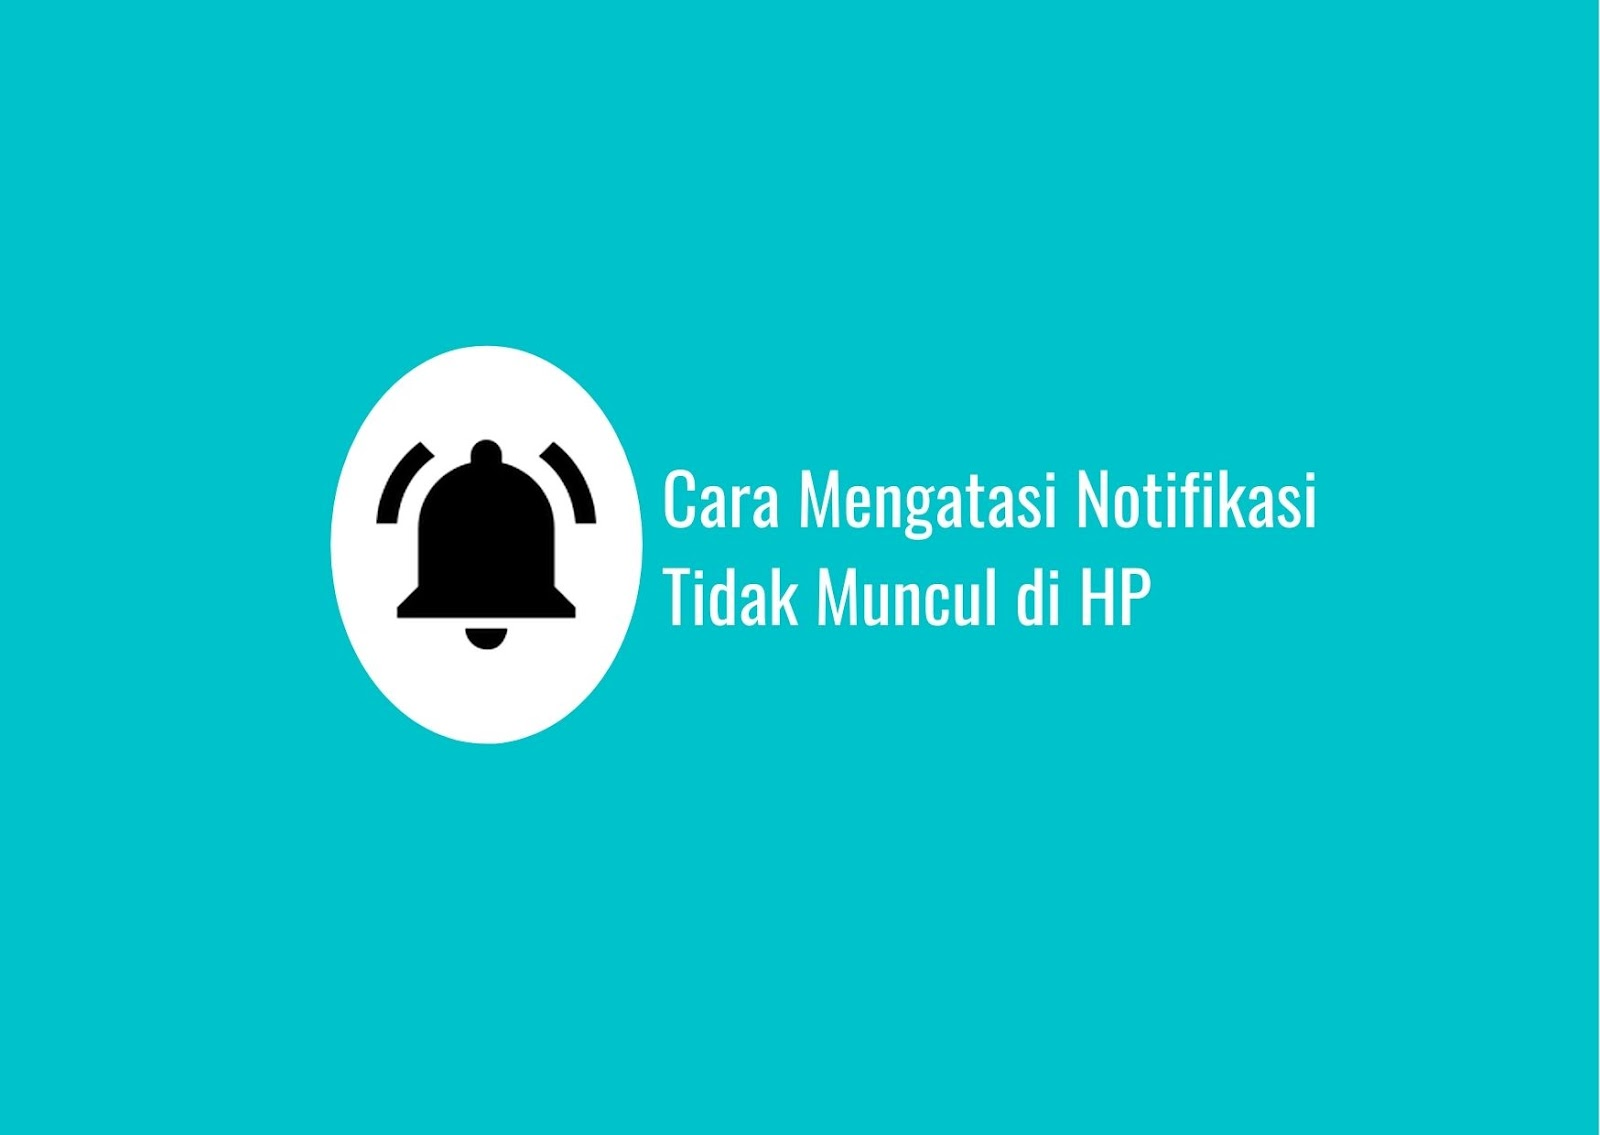 Cara Mengatasi Notifikasi Tidak Muncul di HP